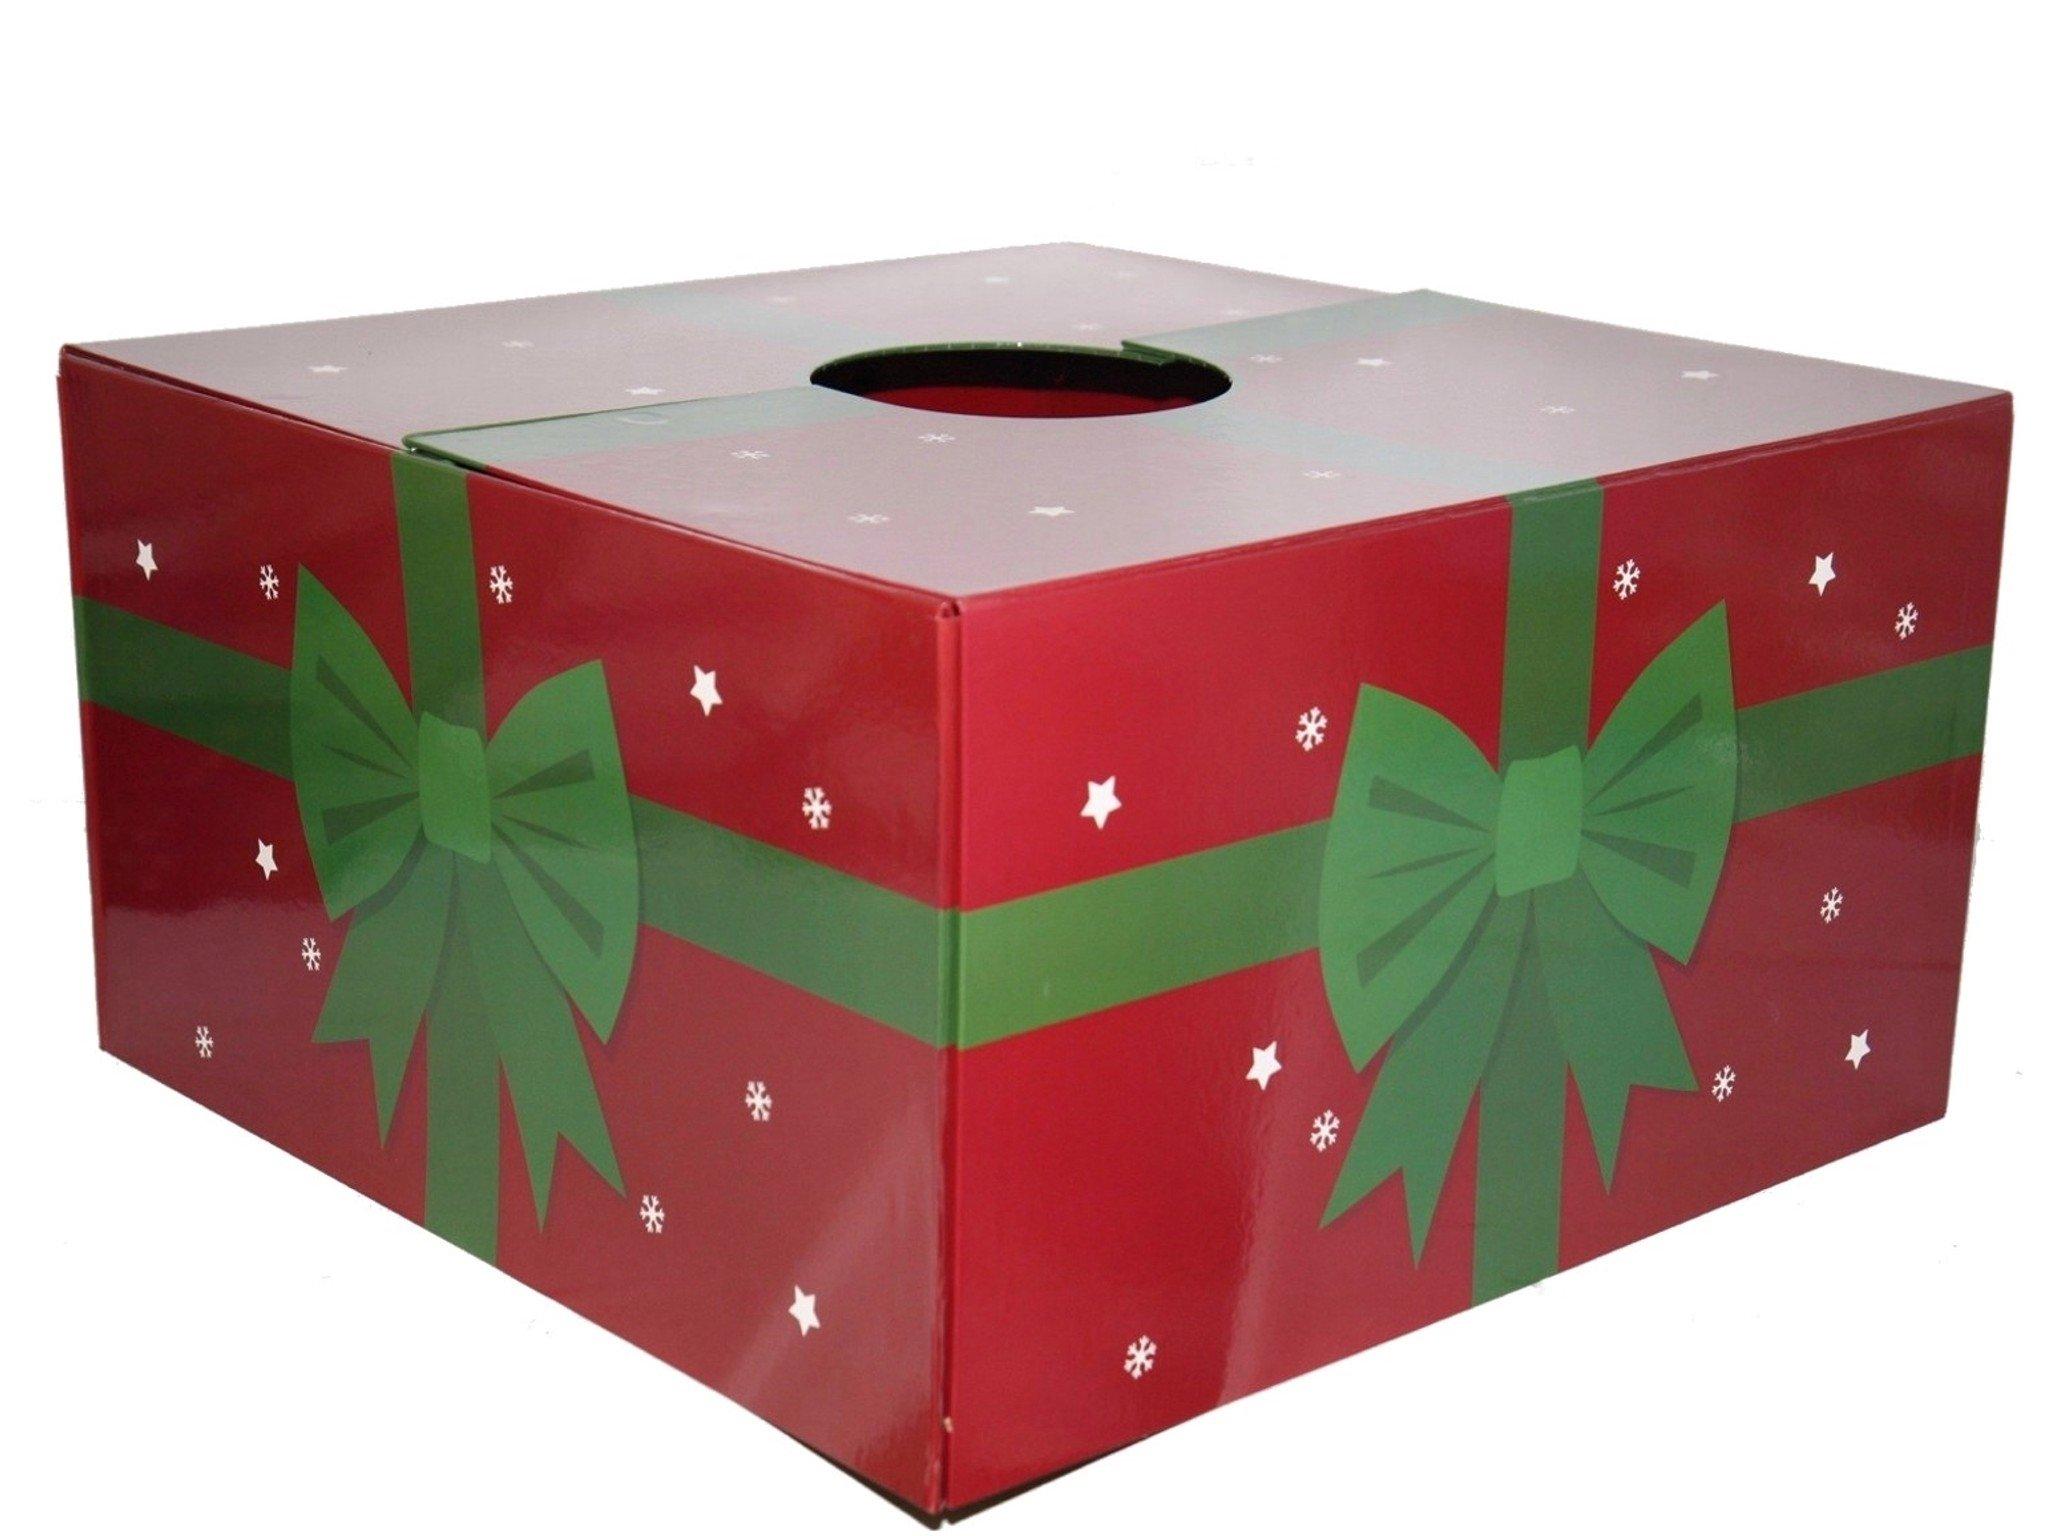 The Original Christmas Tree Box, Red/Green print 20'' x 20'' x 11''large